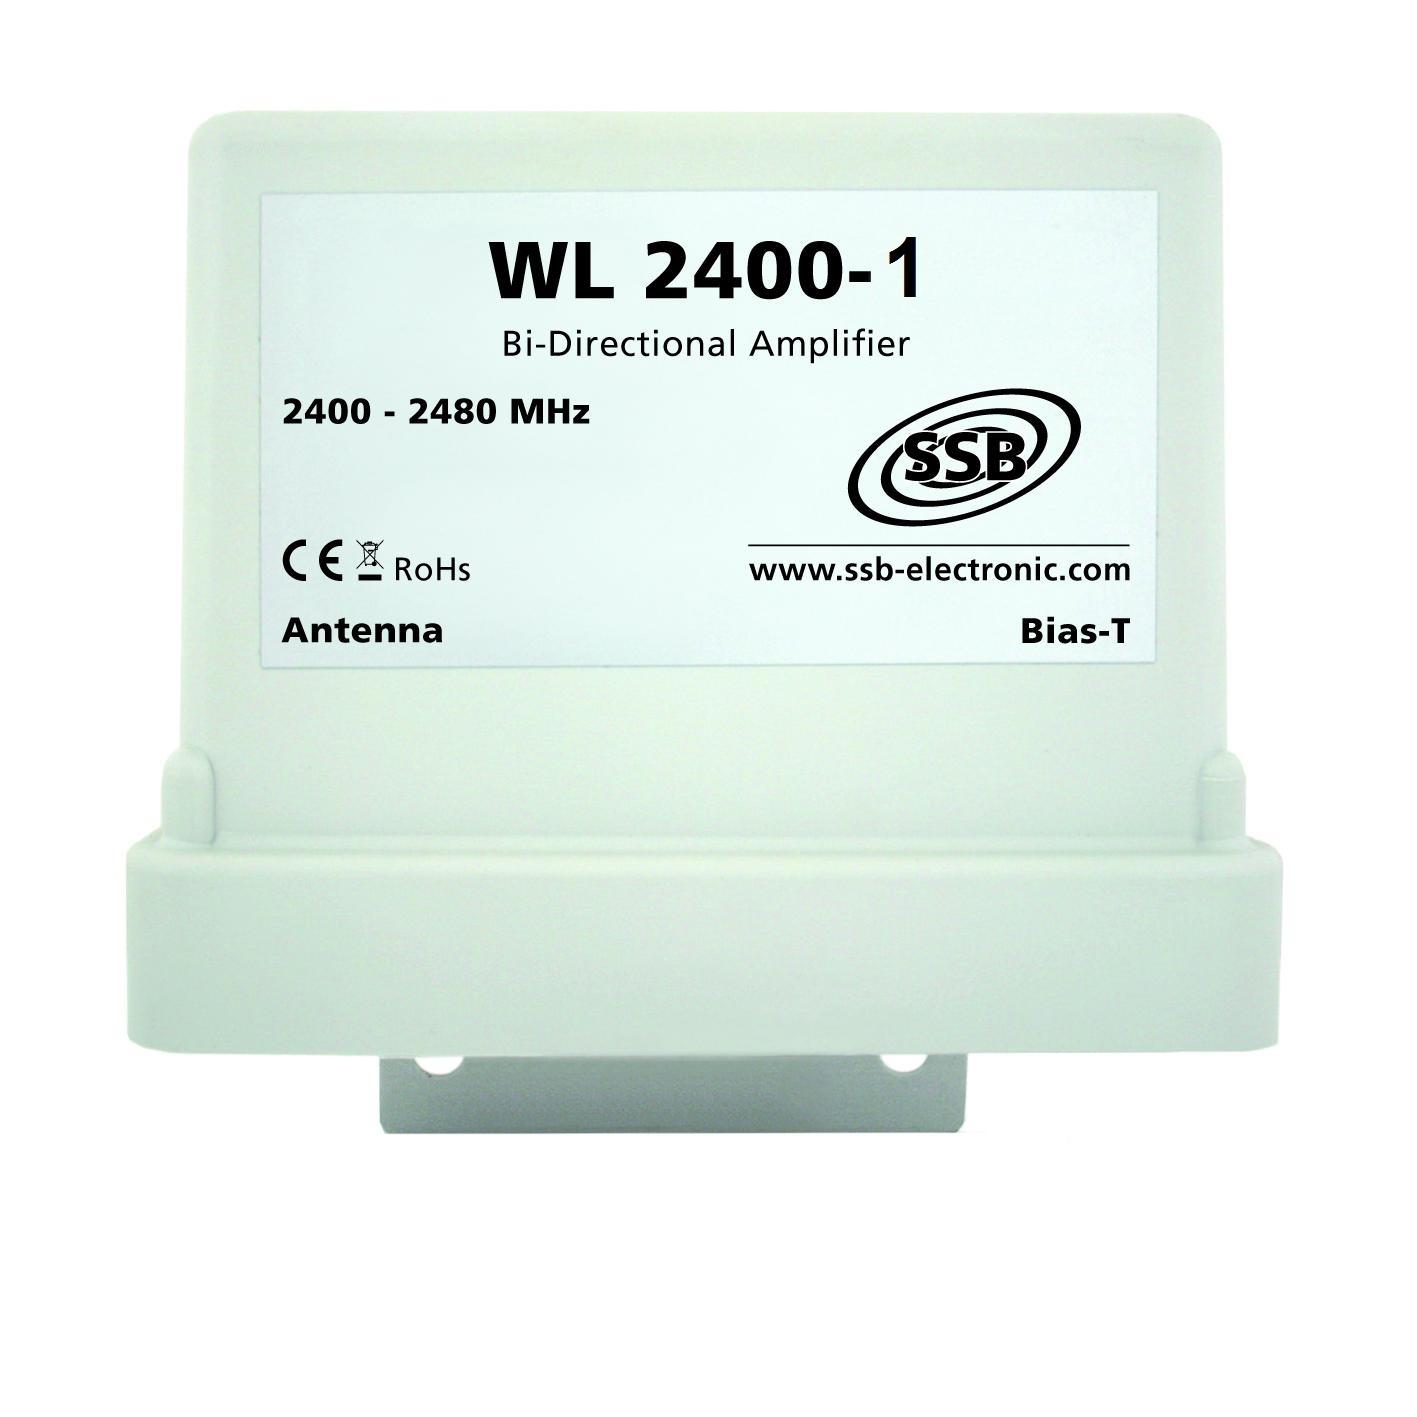 2,4 GHz amplifier